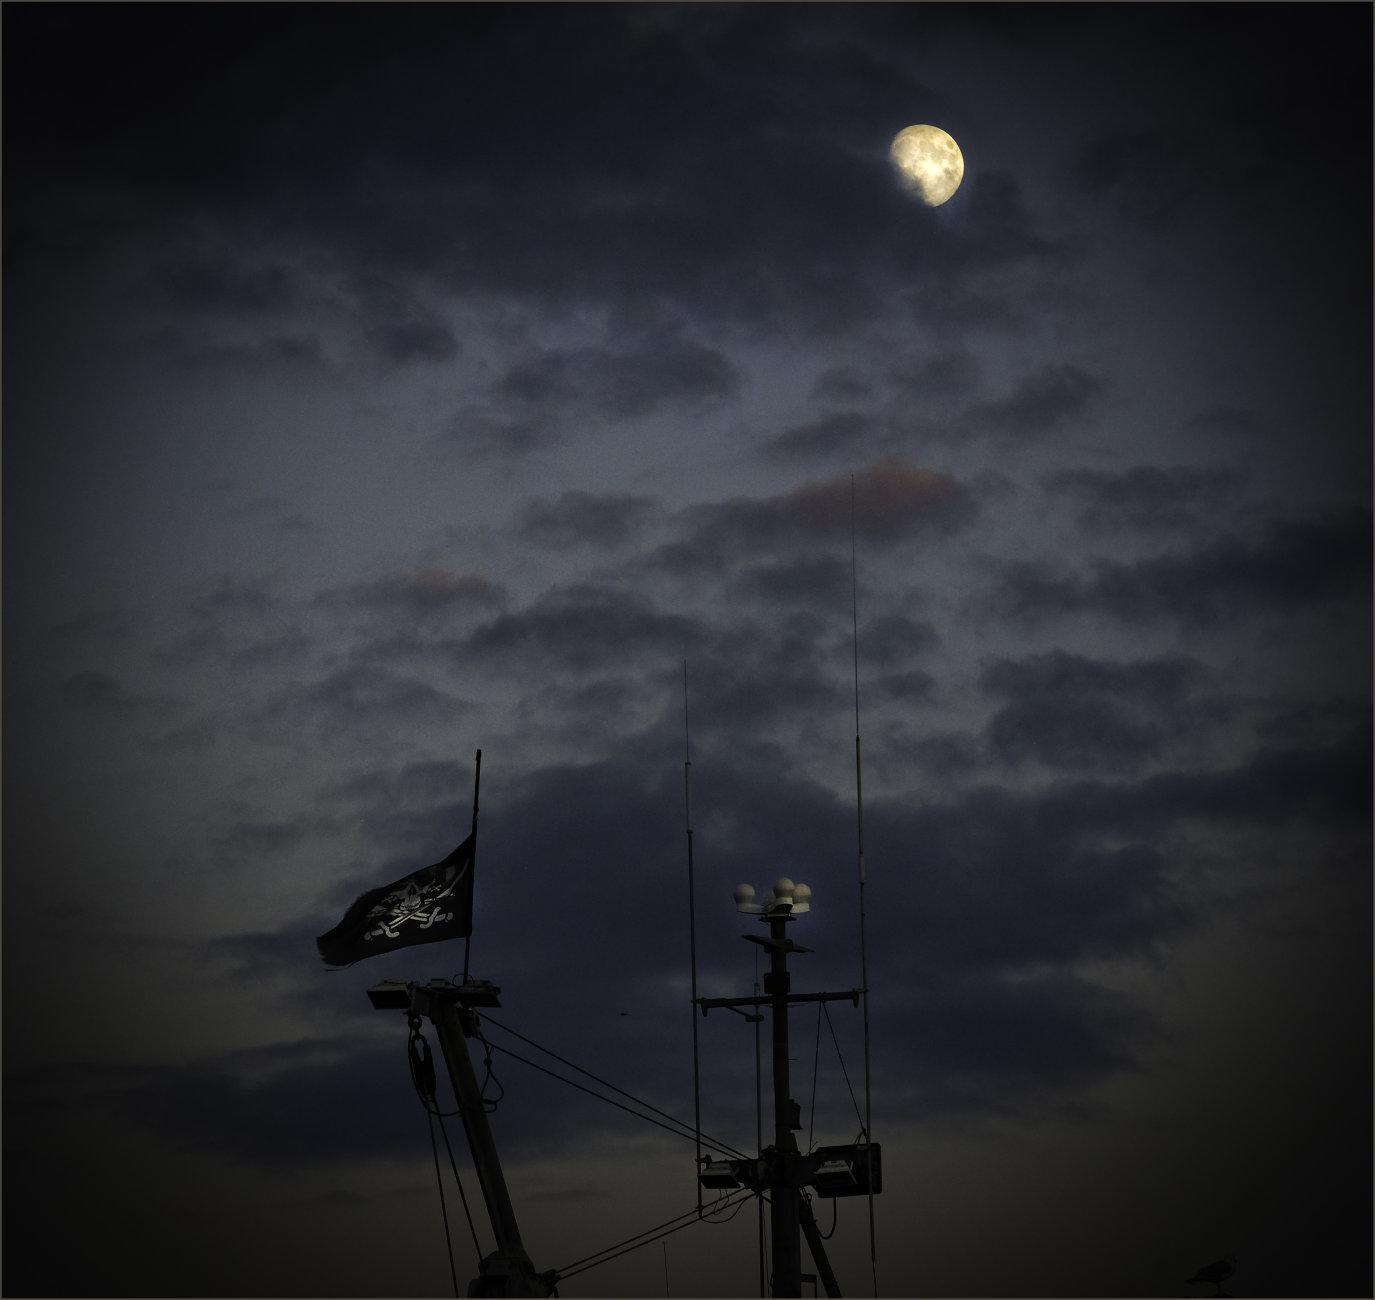 Pirates Moon